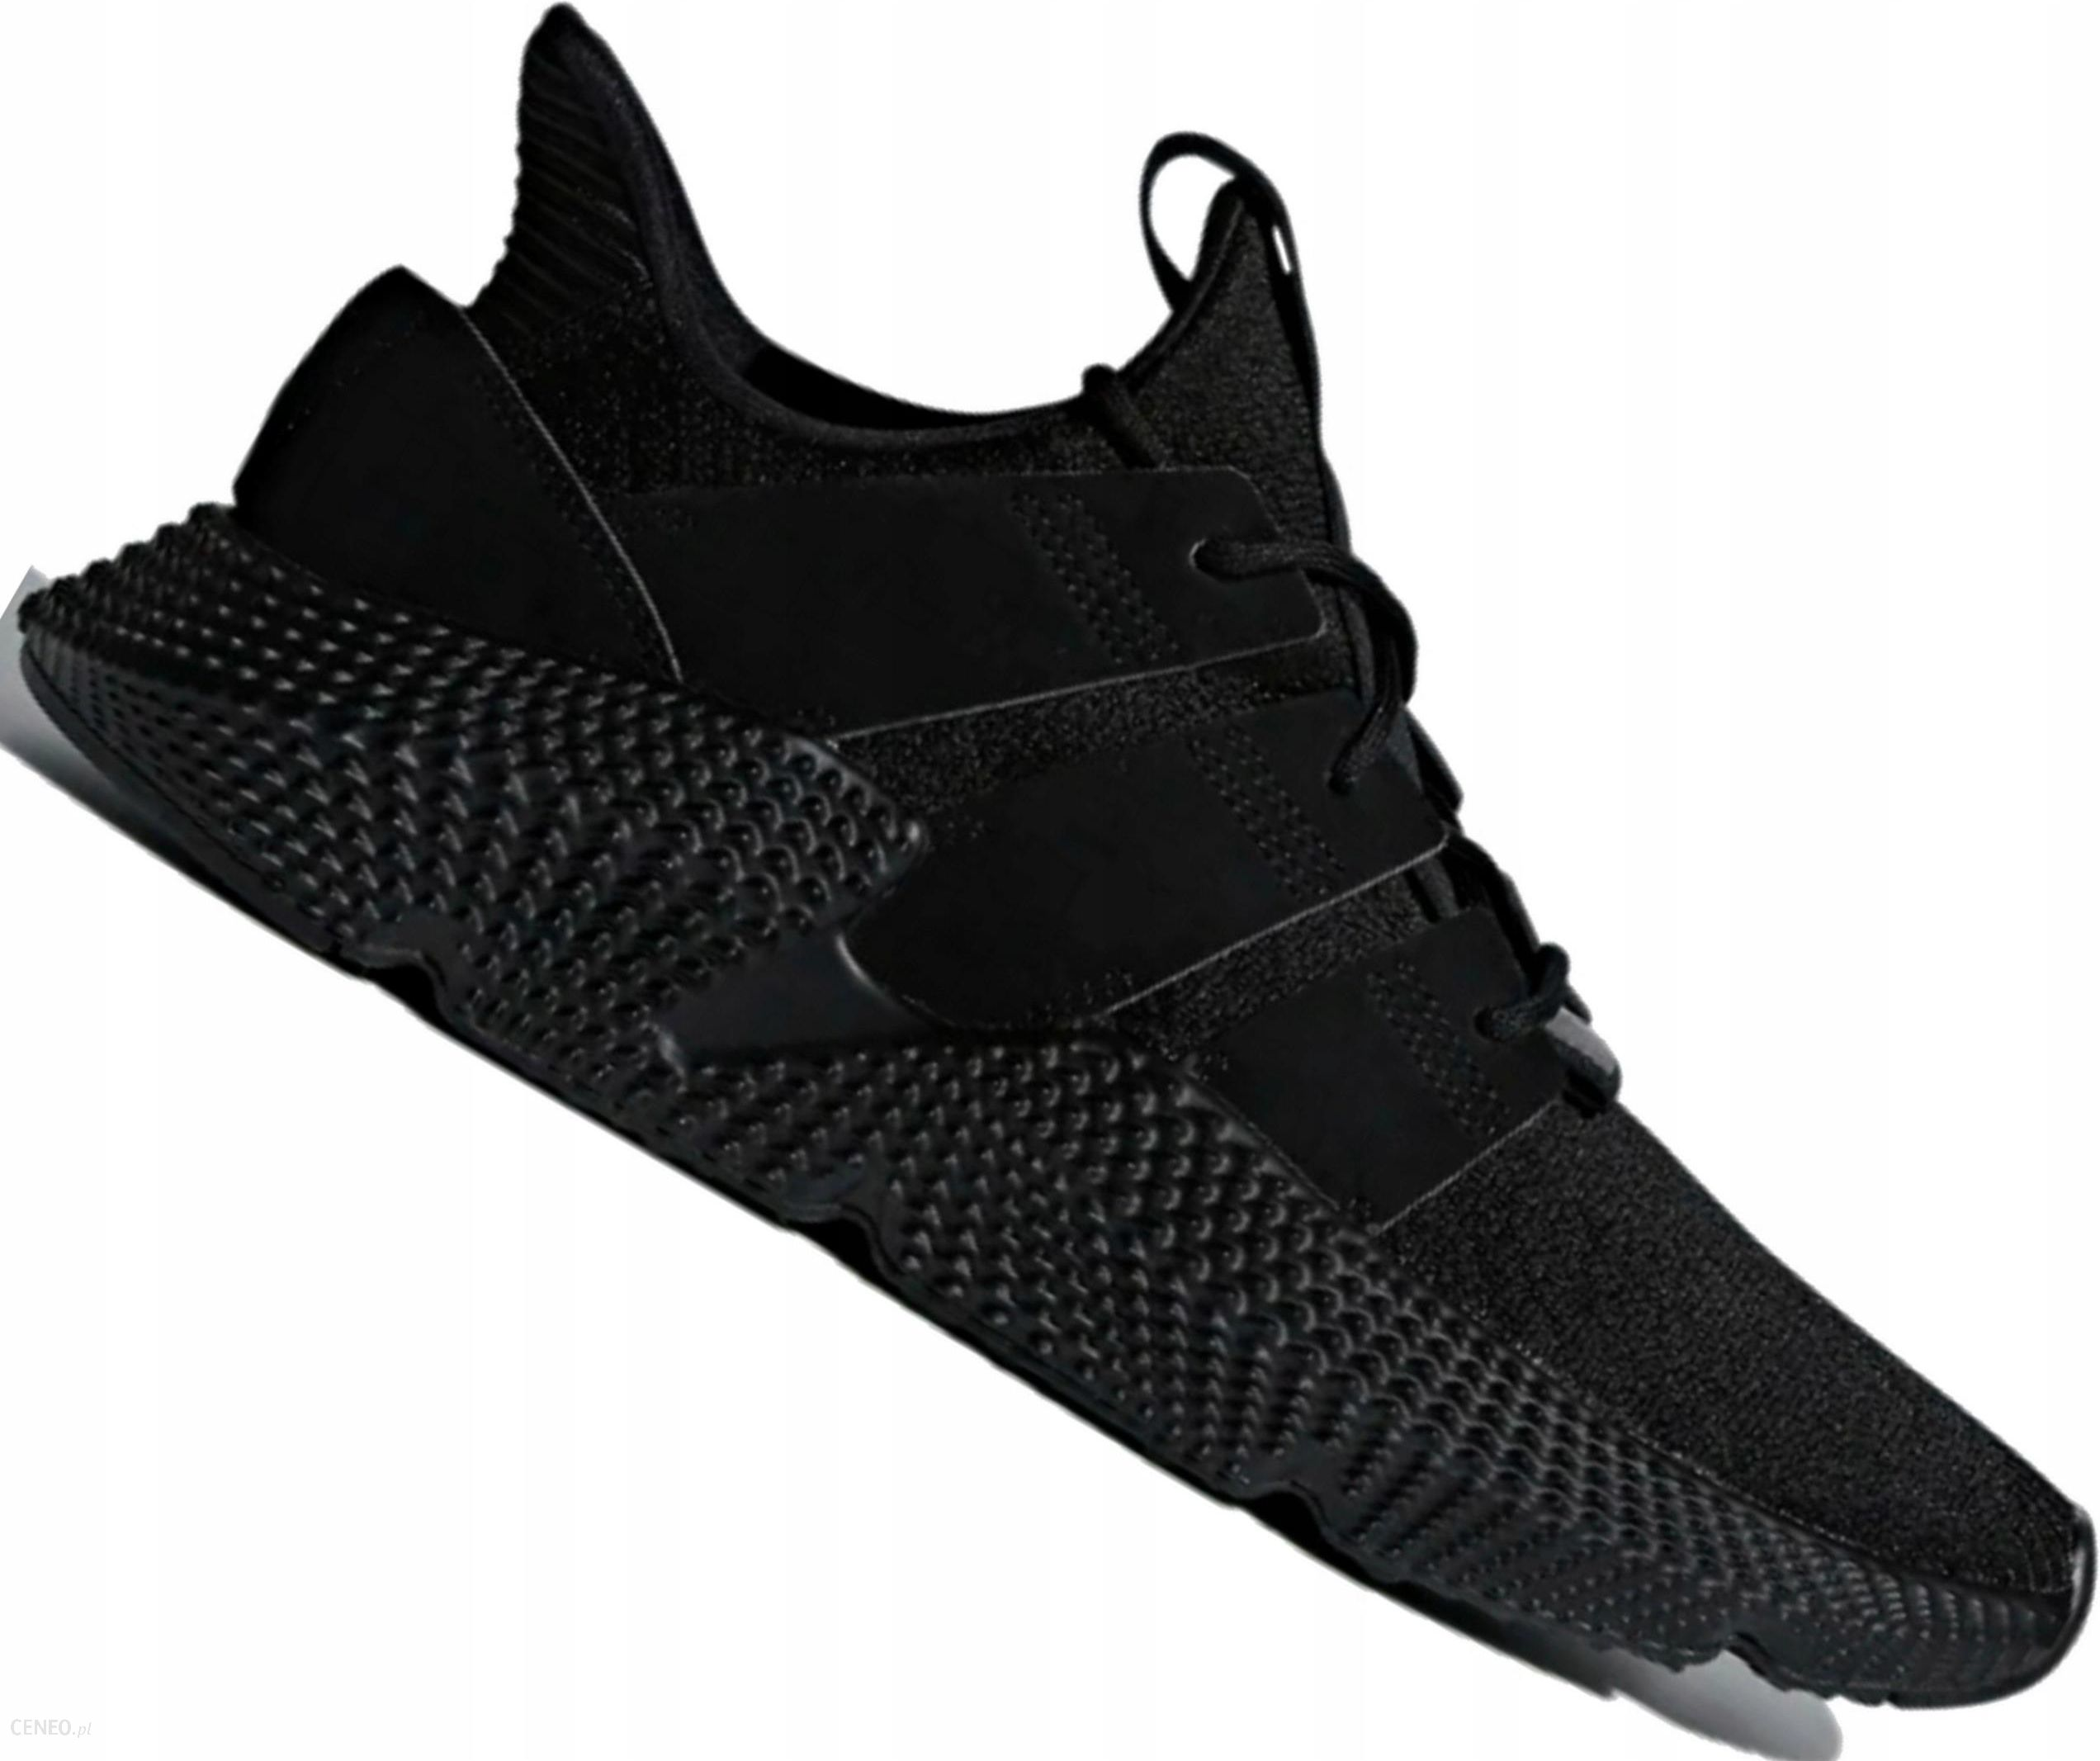 Buty Adidas Originals Prophere B37453 Oryginalne Ceny i opinie Ceneo.pl